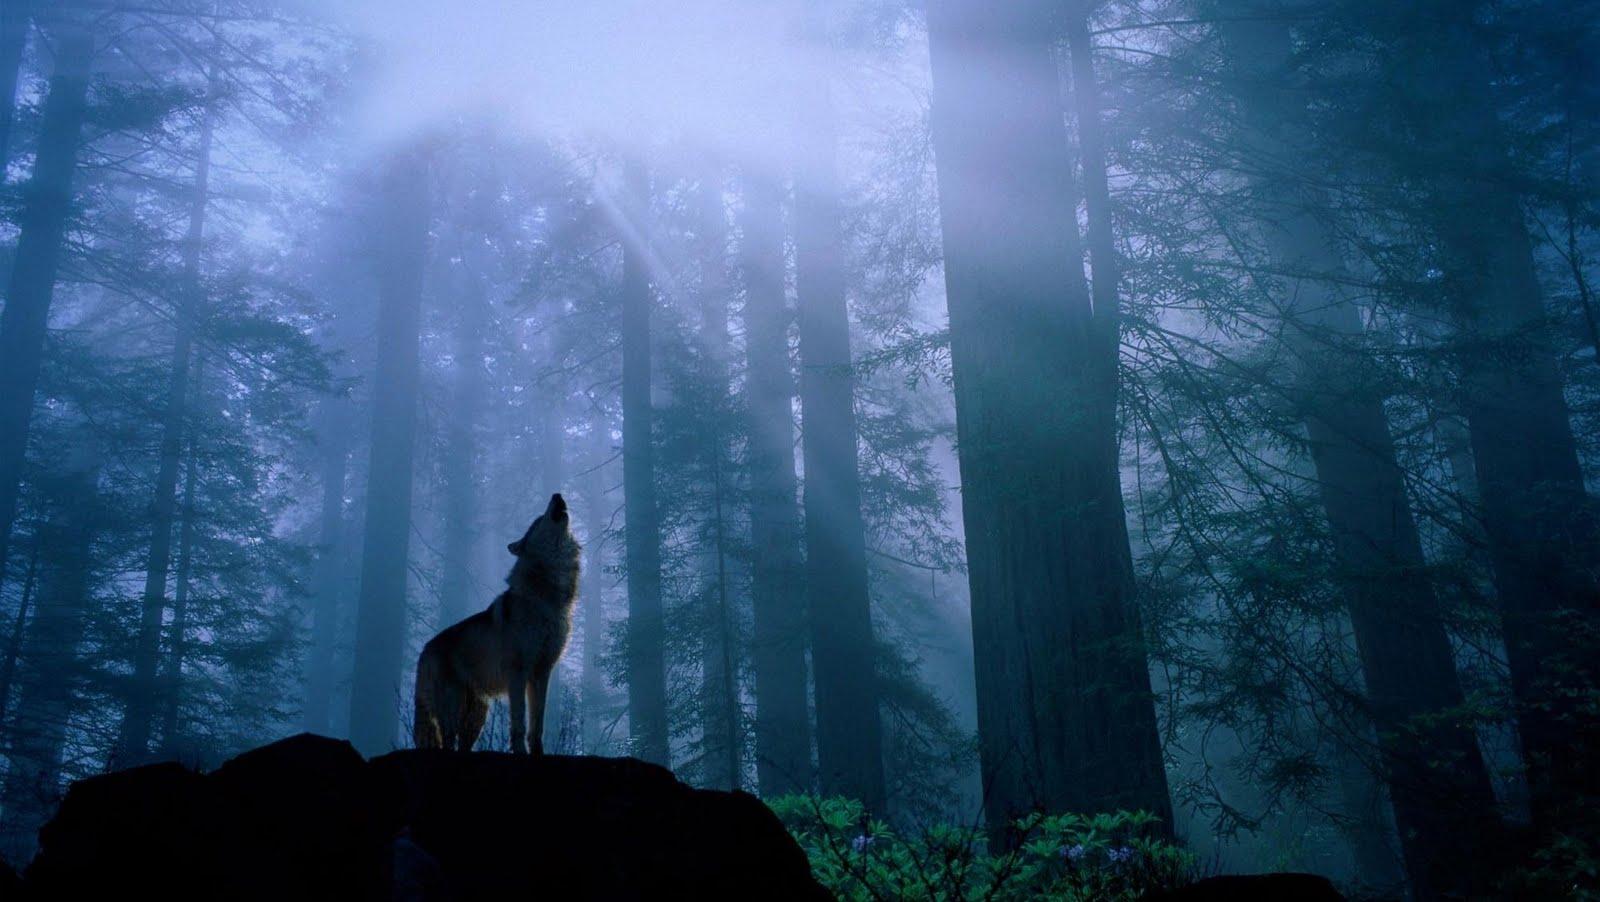 Wolf - Lobo aullido en el bosque - Wallpapers HD ...